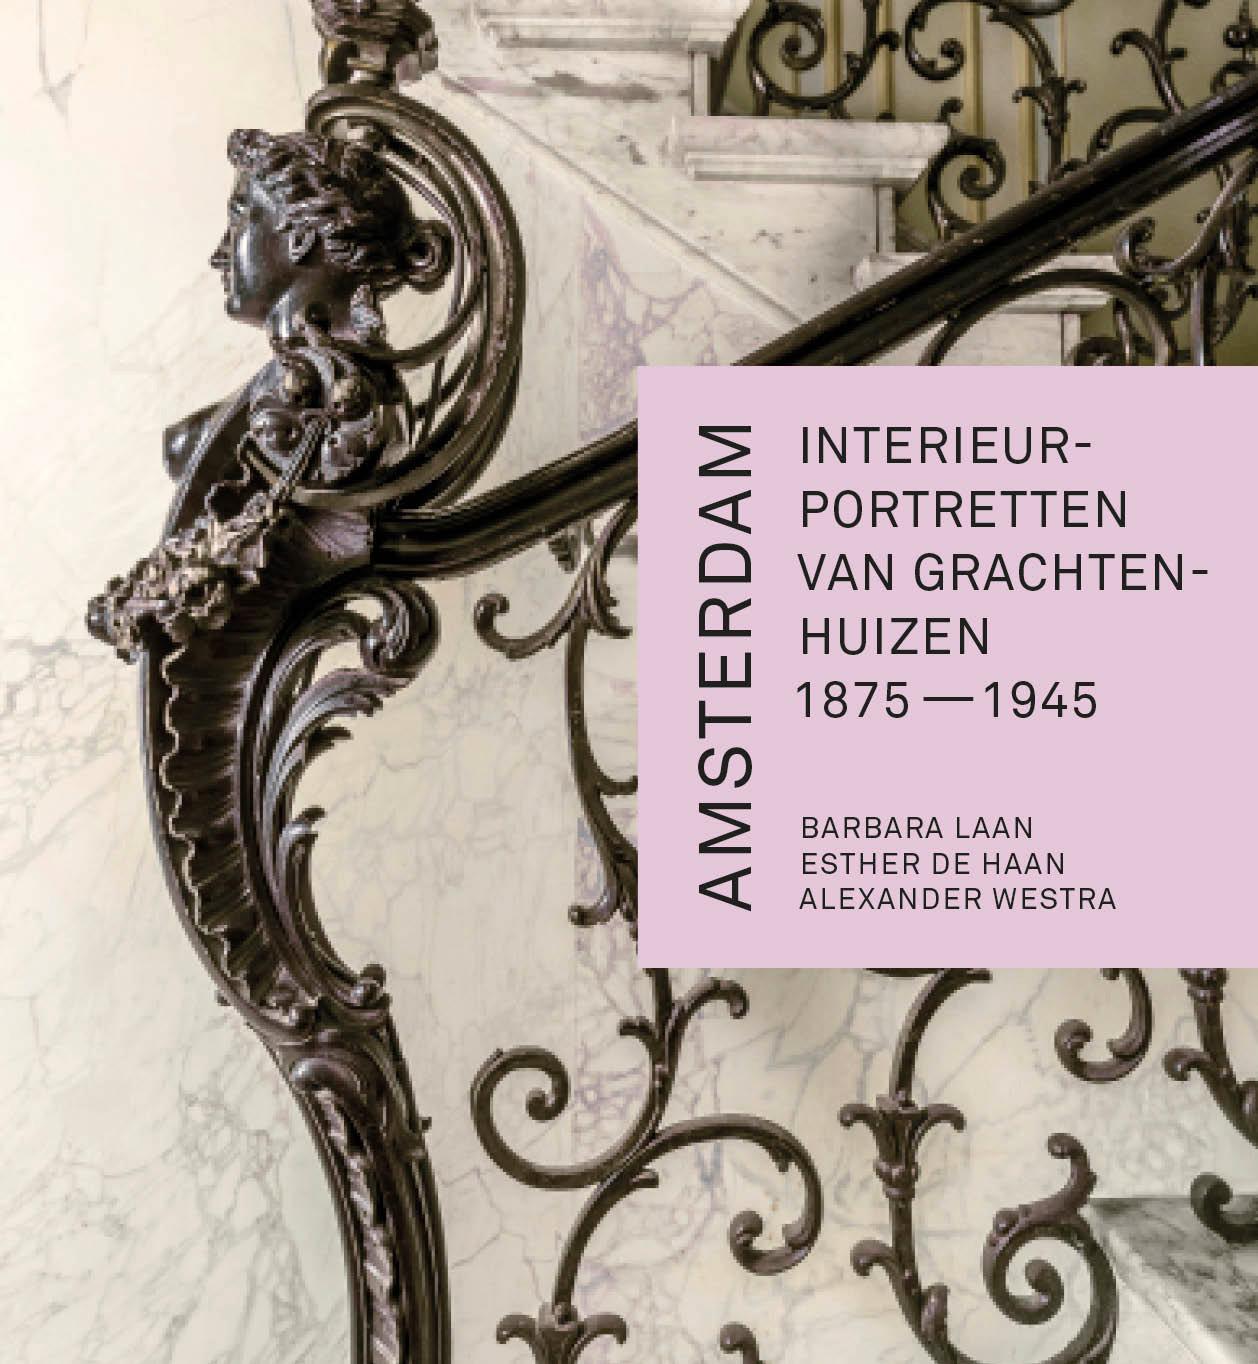 http://www.historischeinterieursamsterdam.nl/interieuronderzoek/wp-content/uploads/2015/07/cover-Adam.jpg